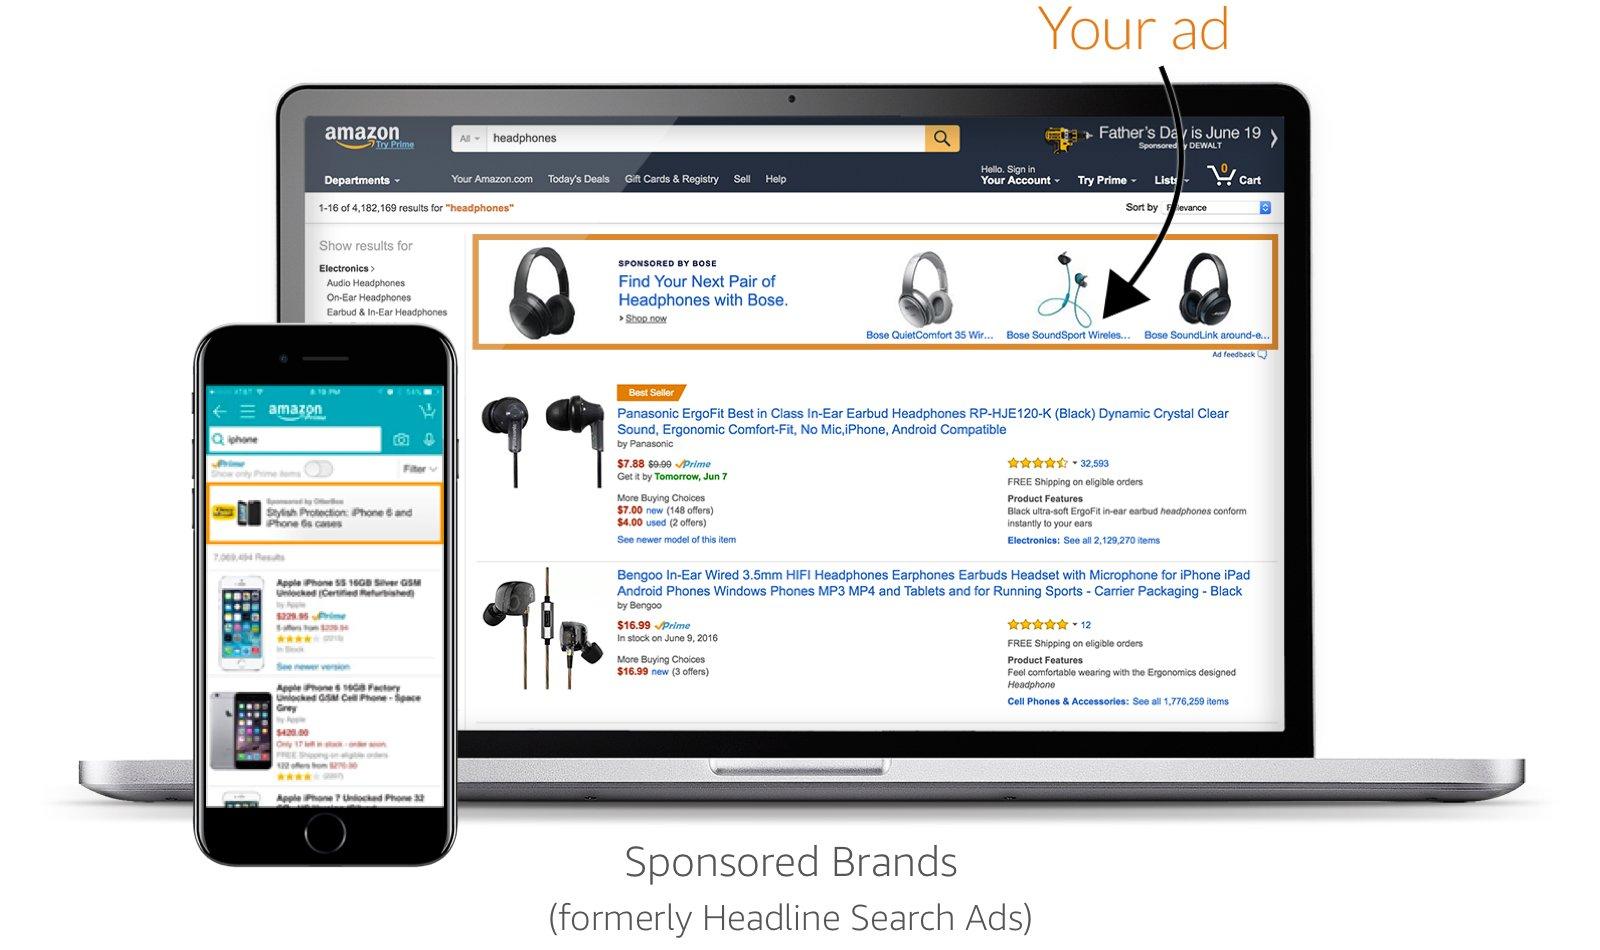 AgencyVista-Amazon-SponsoredBrandCampaign